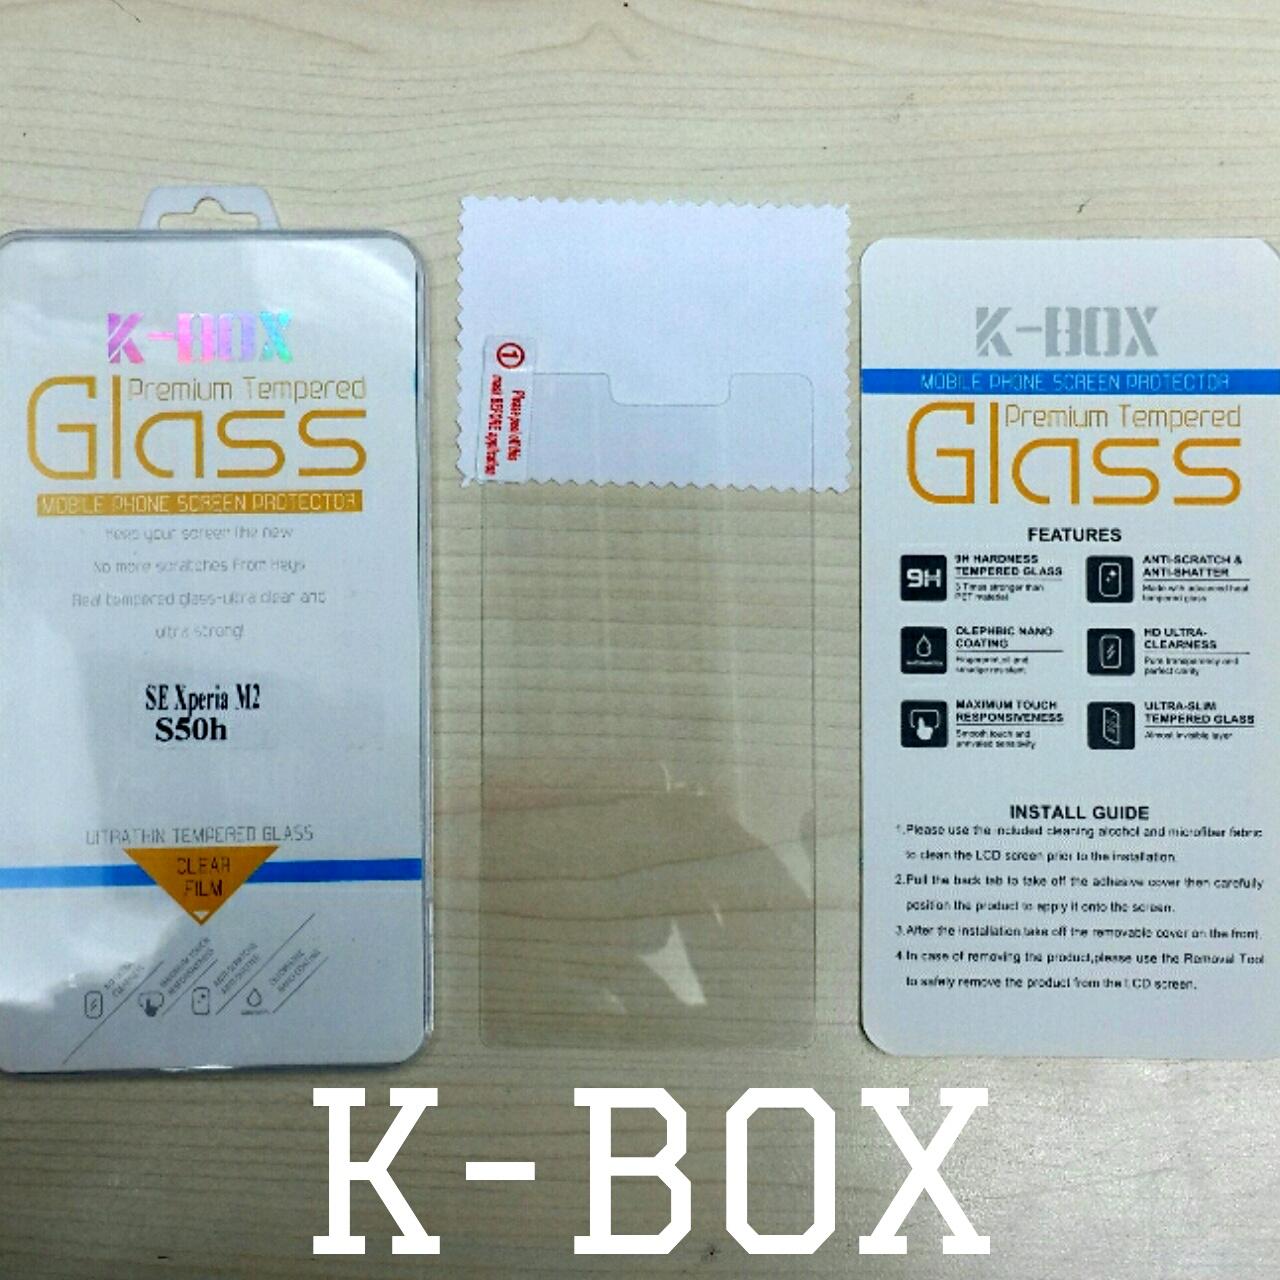 Jual Tempered Glass KboX For XiaoMi 3, XiaoMi 4, RedMi 1s , Murah -